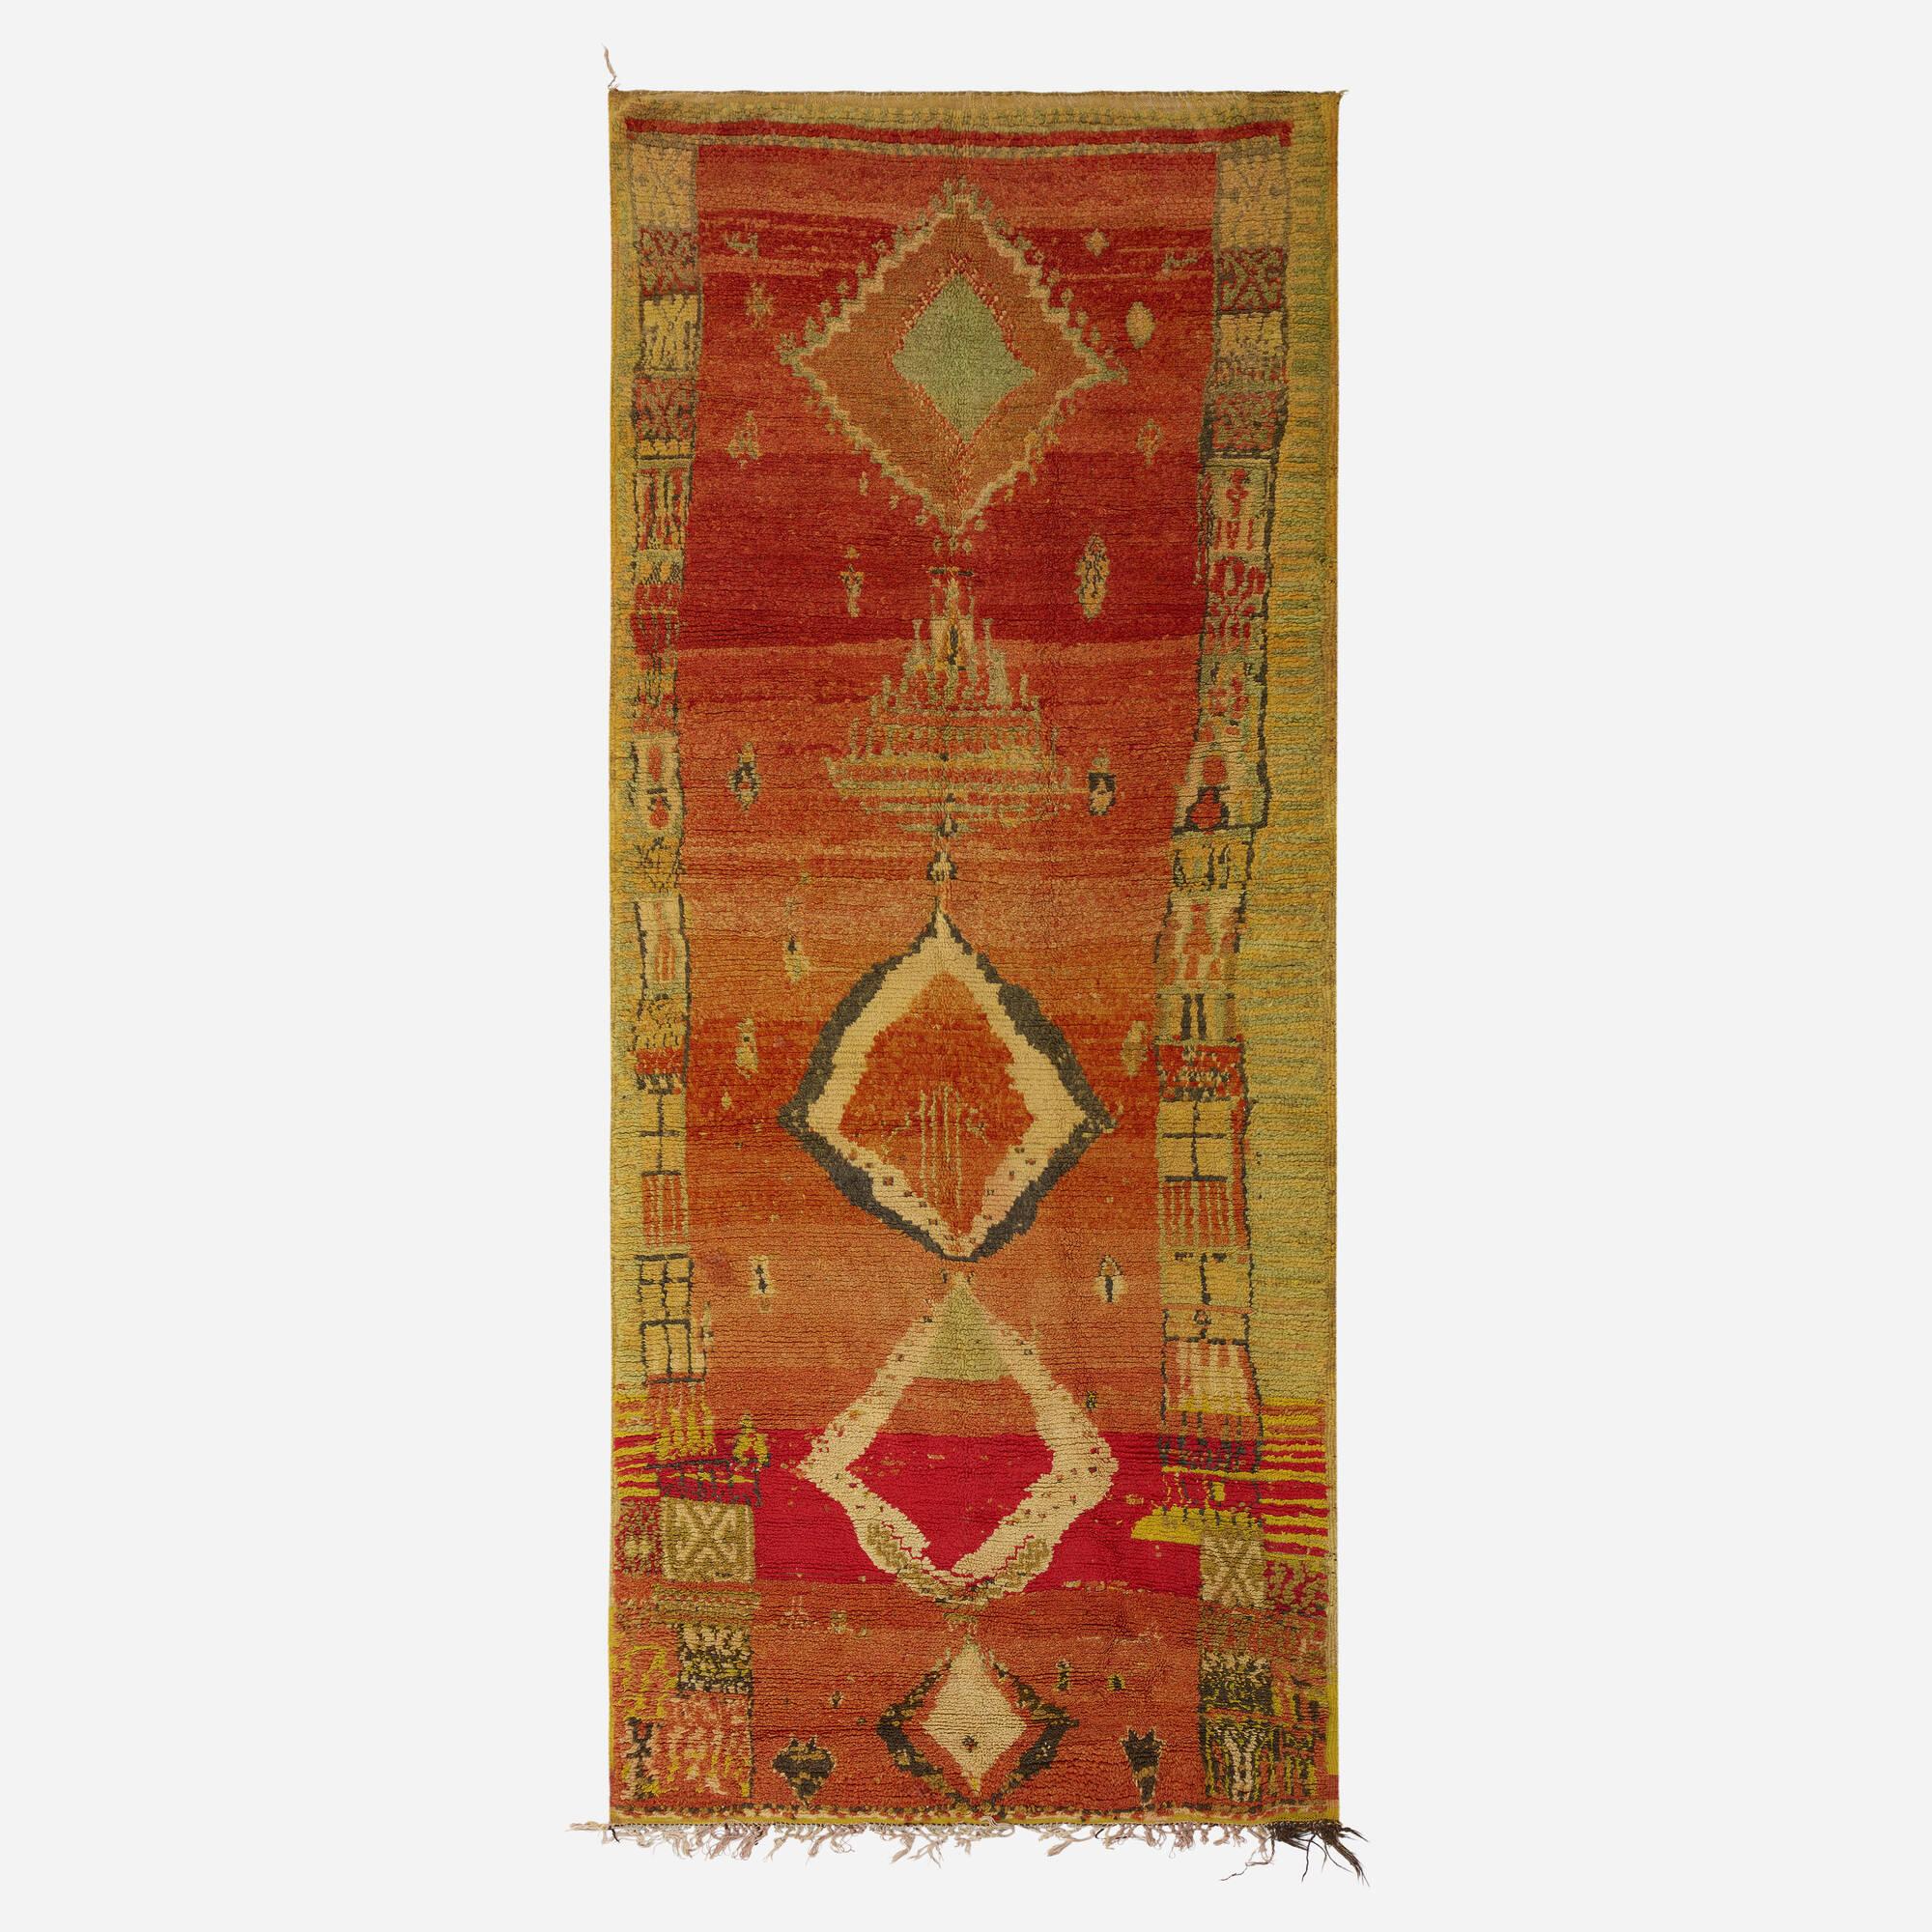 337: Moroccan / pile carpet (1 of 1)